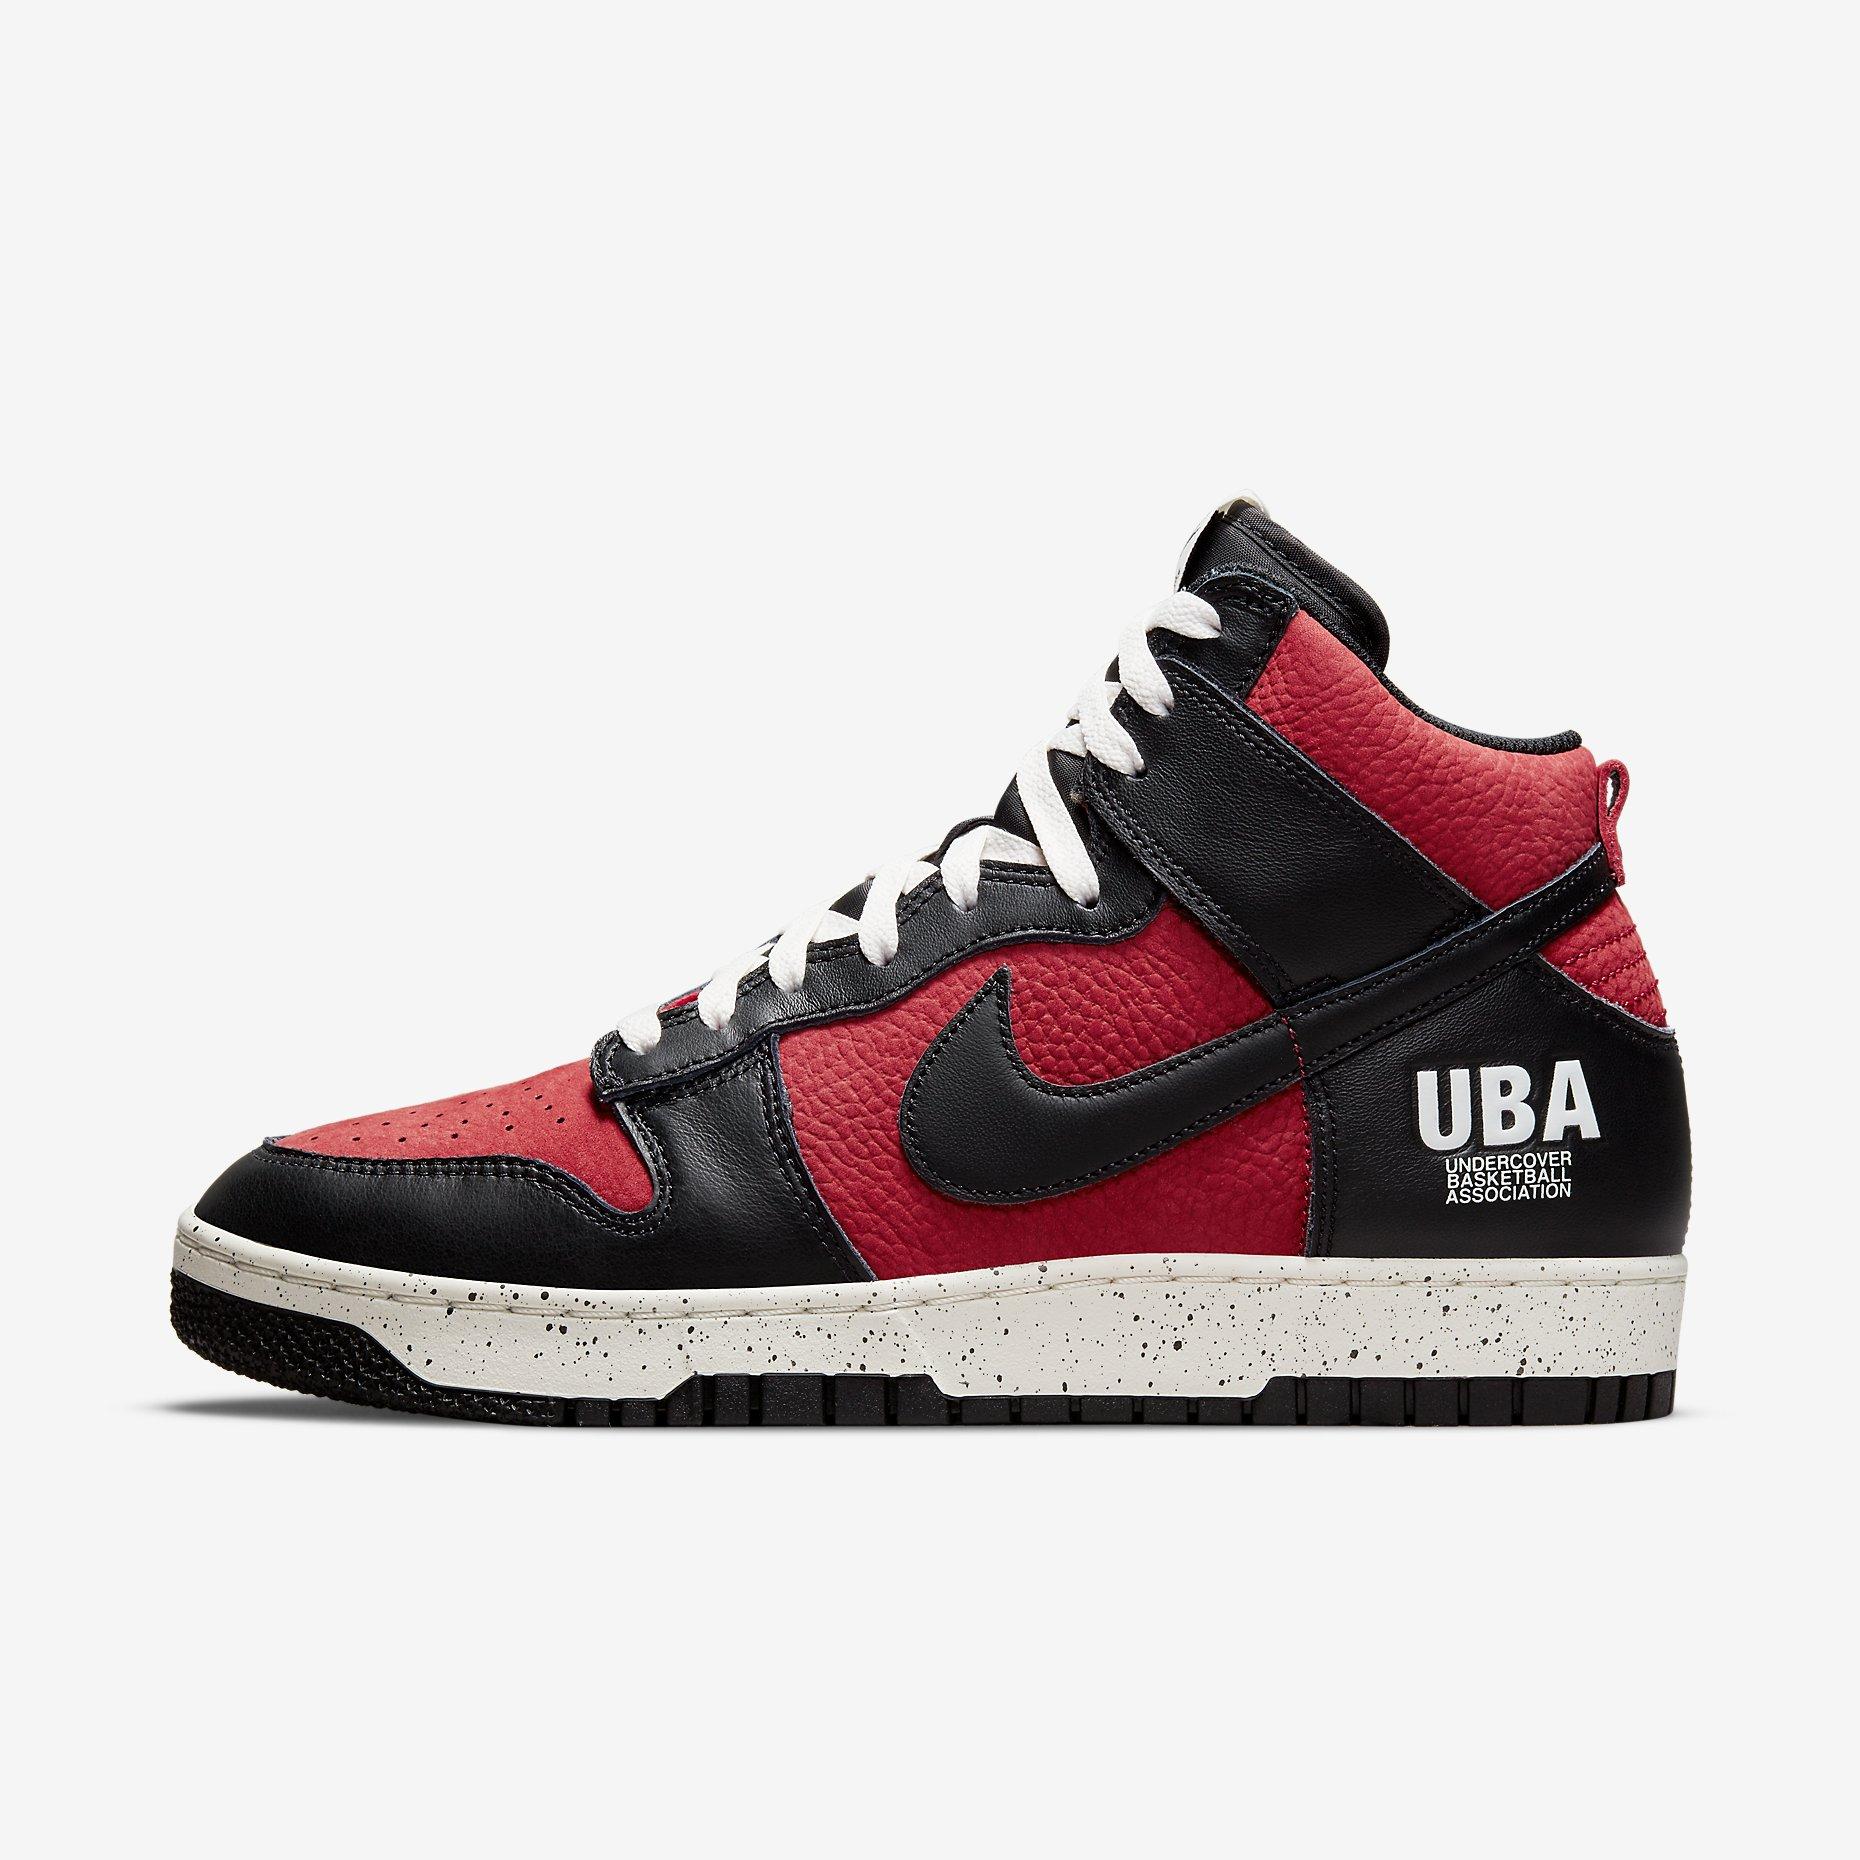 Undercover x Nike Dunk High 'UBA'}